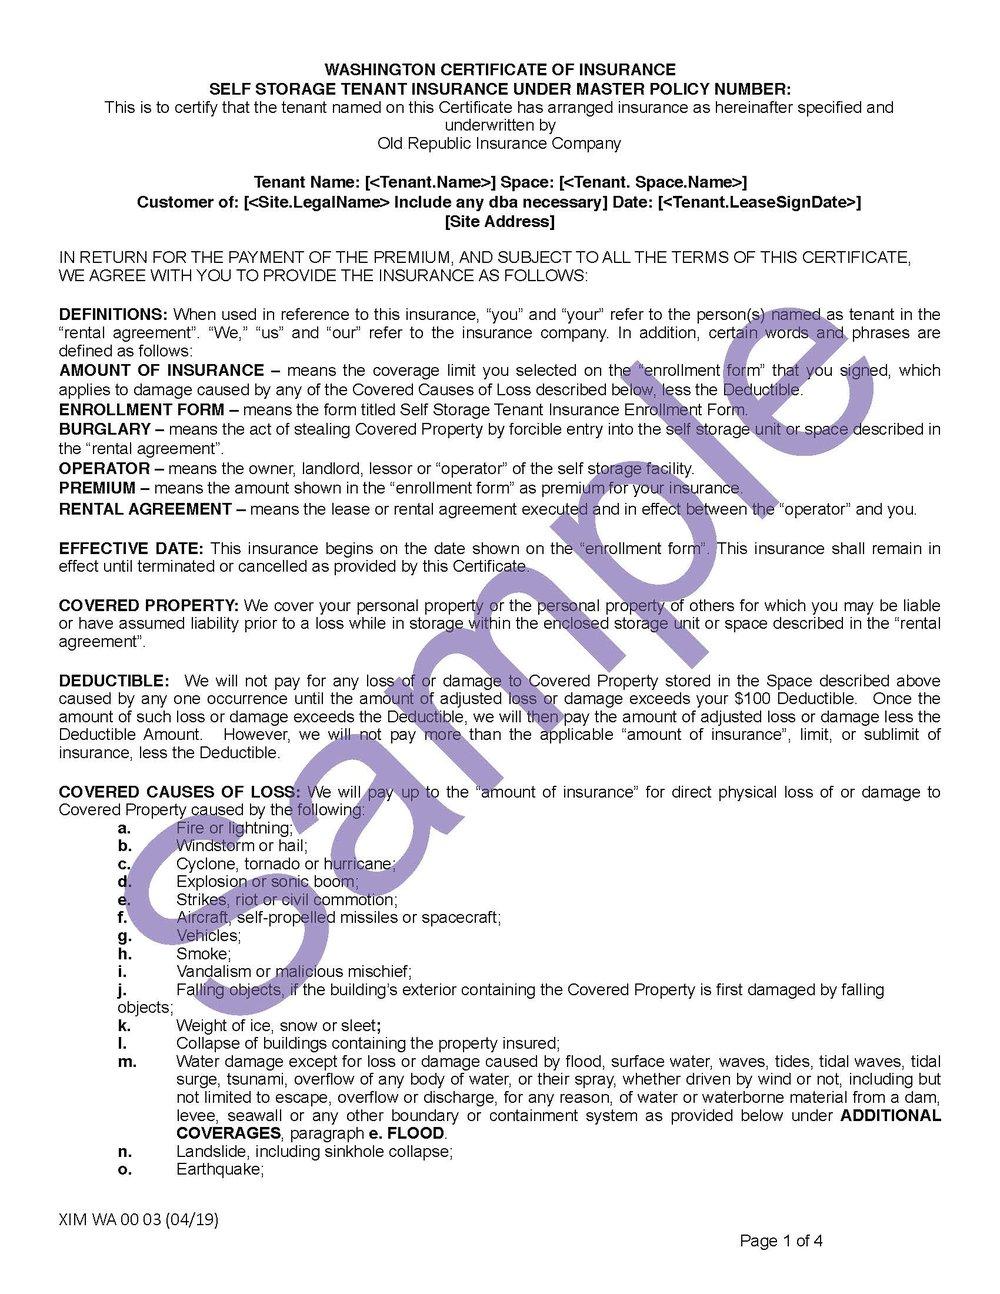 XIM WA 00 03 04 19 Washington Certificate of InsuranceSample_Page_1.jpg